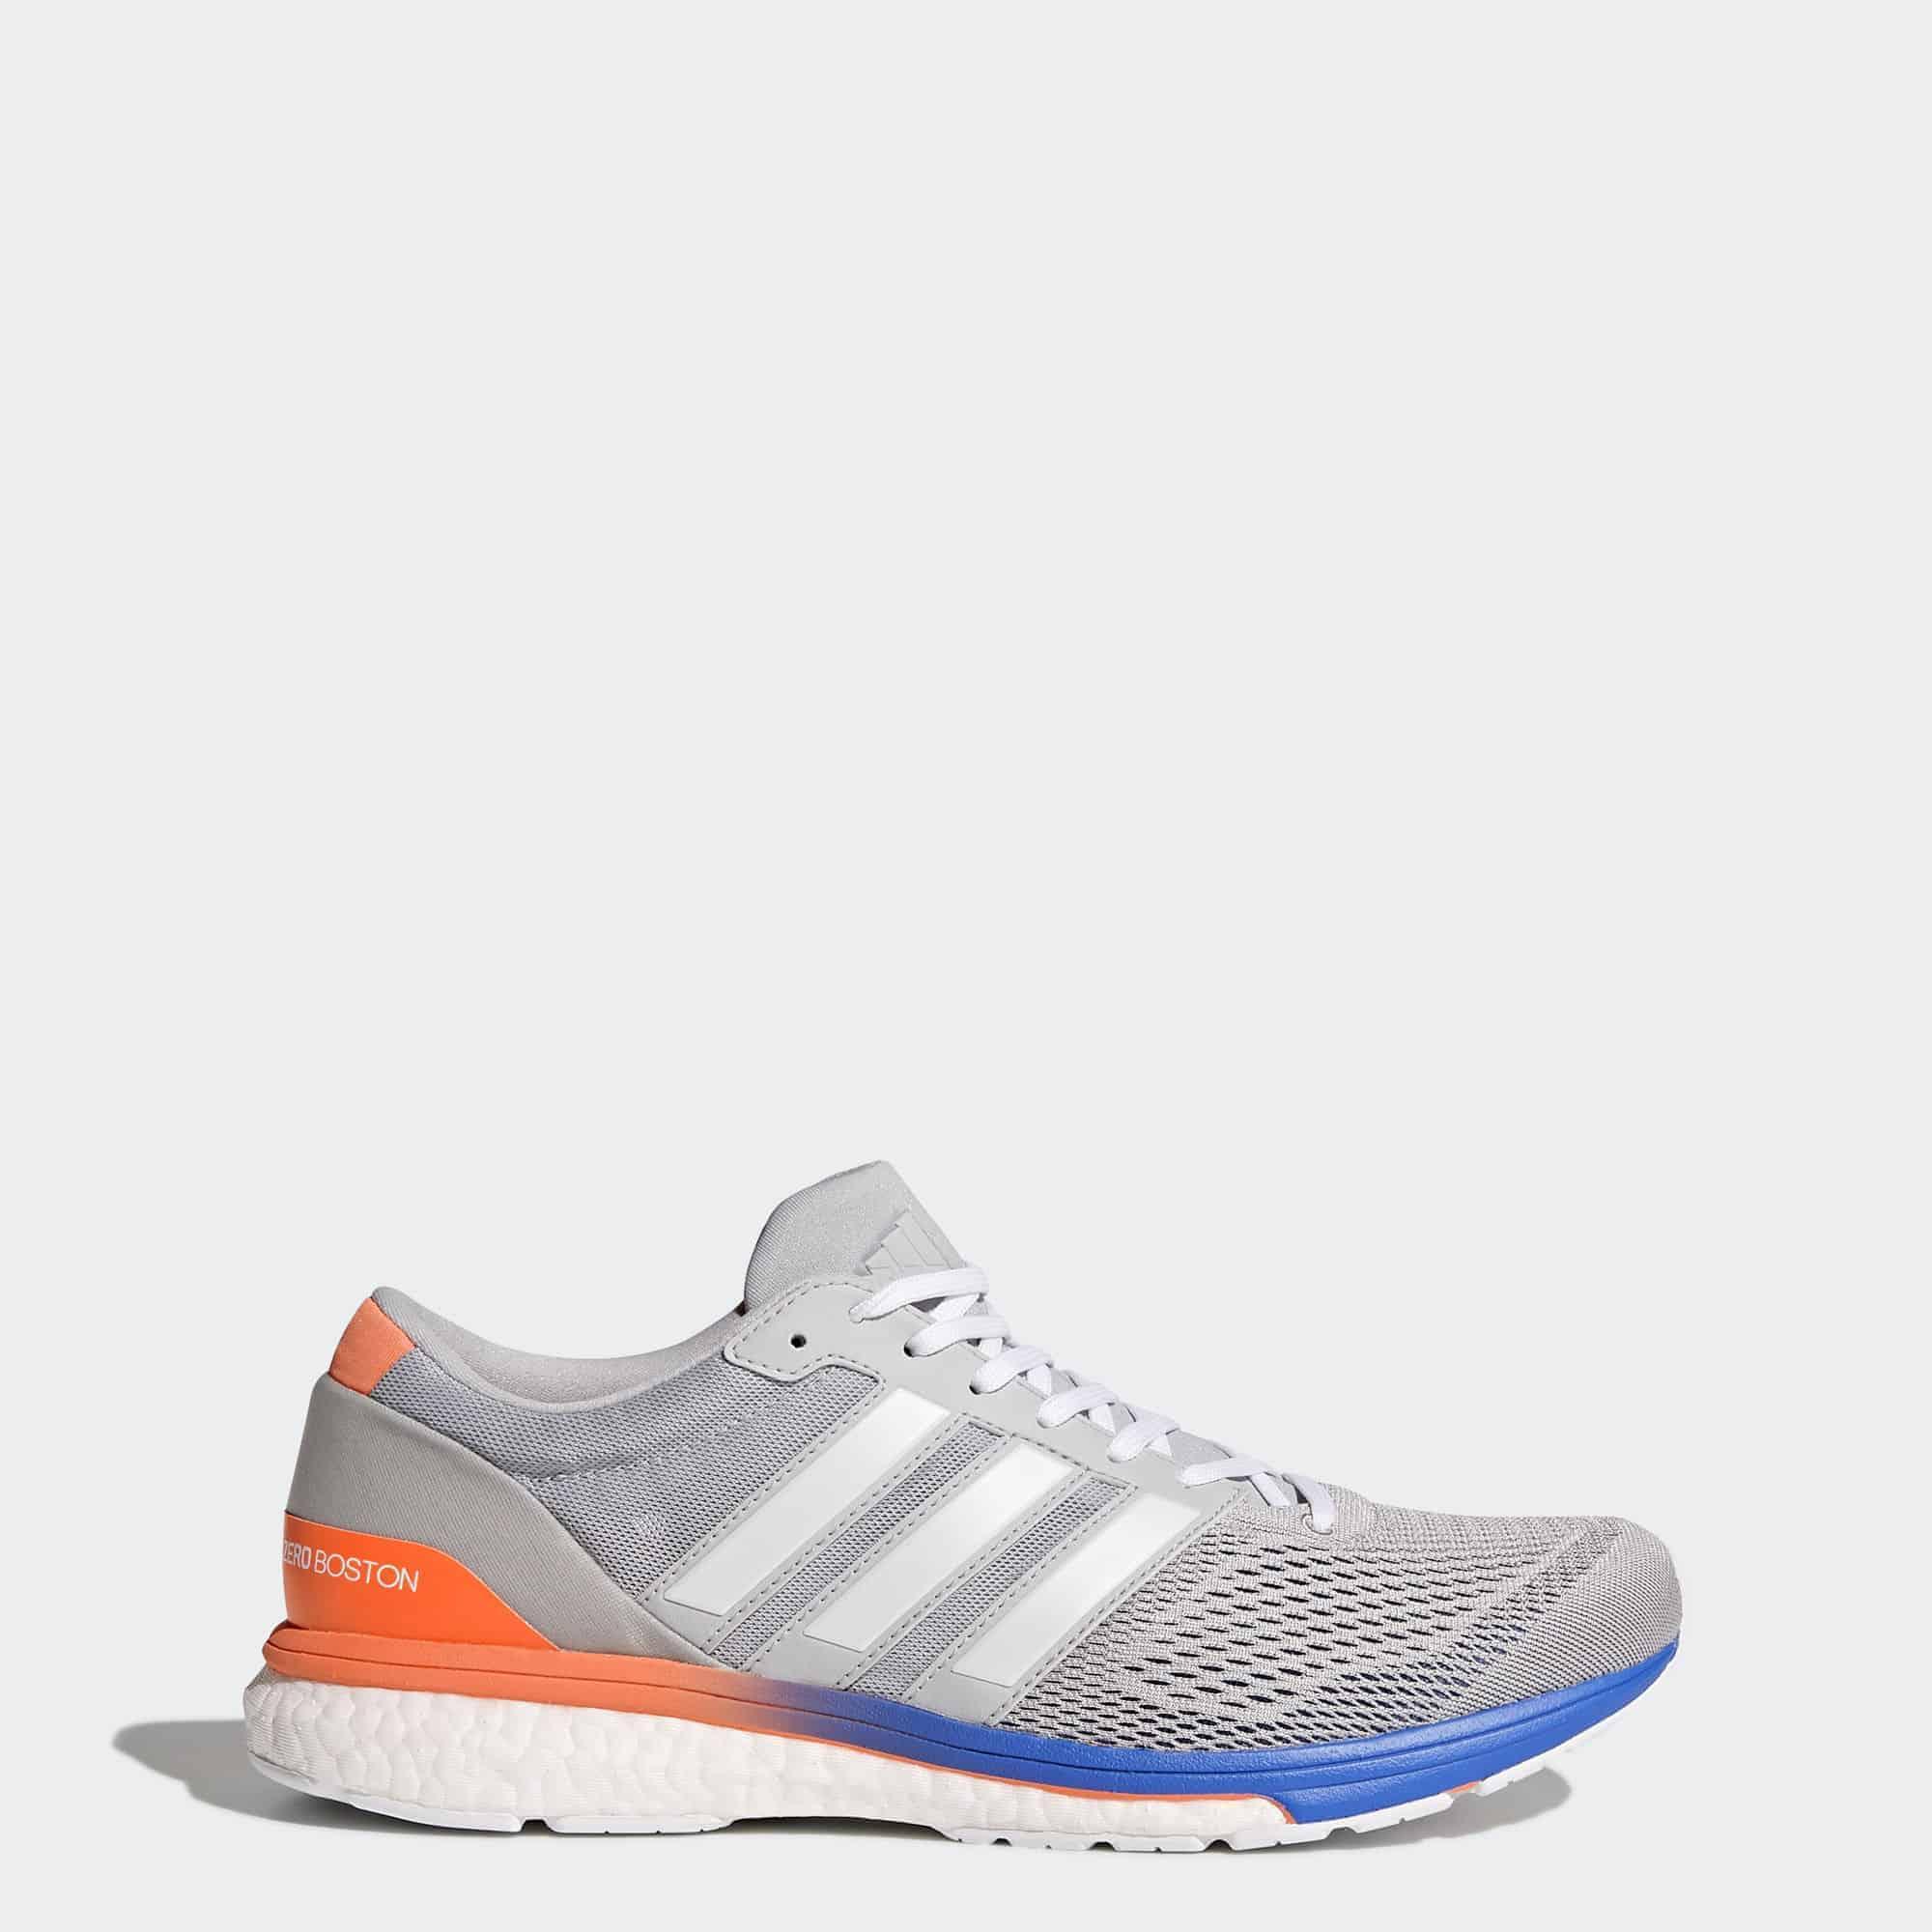 Кроссовки для бега Adidas Adizero Boston 6 мужские